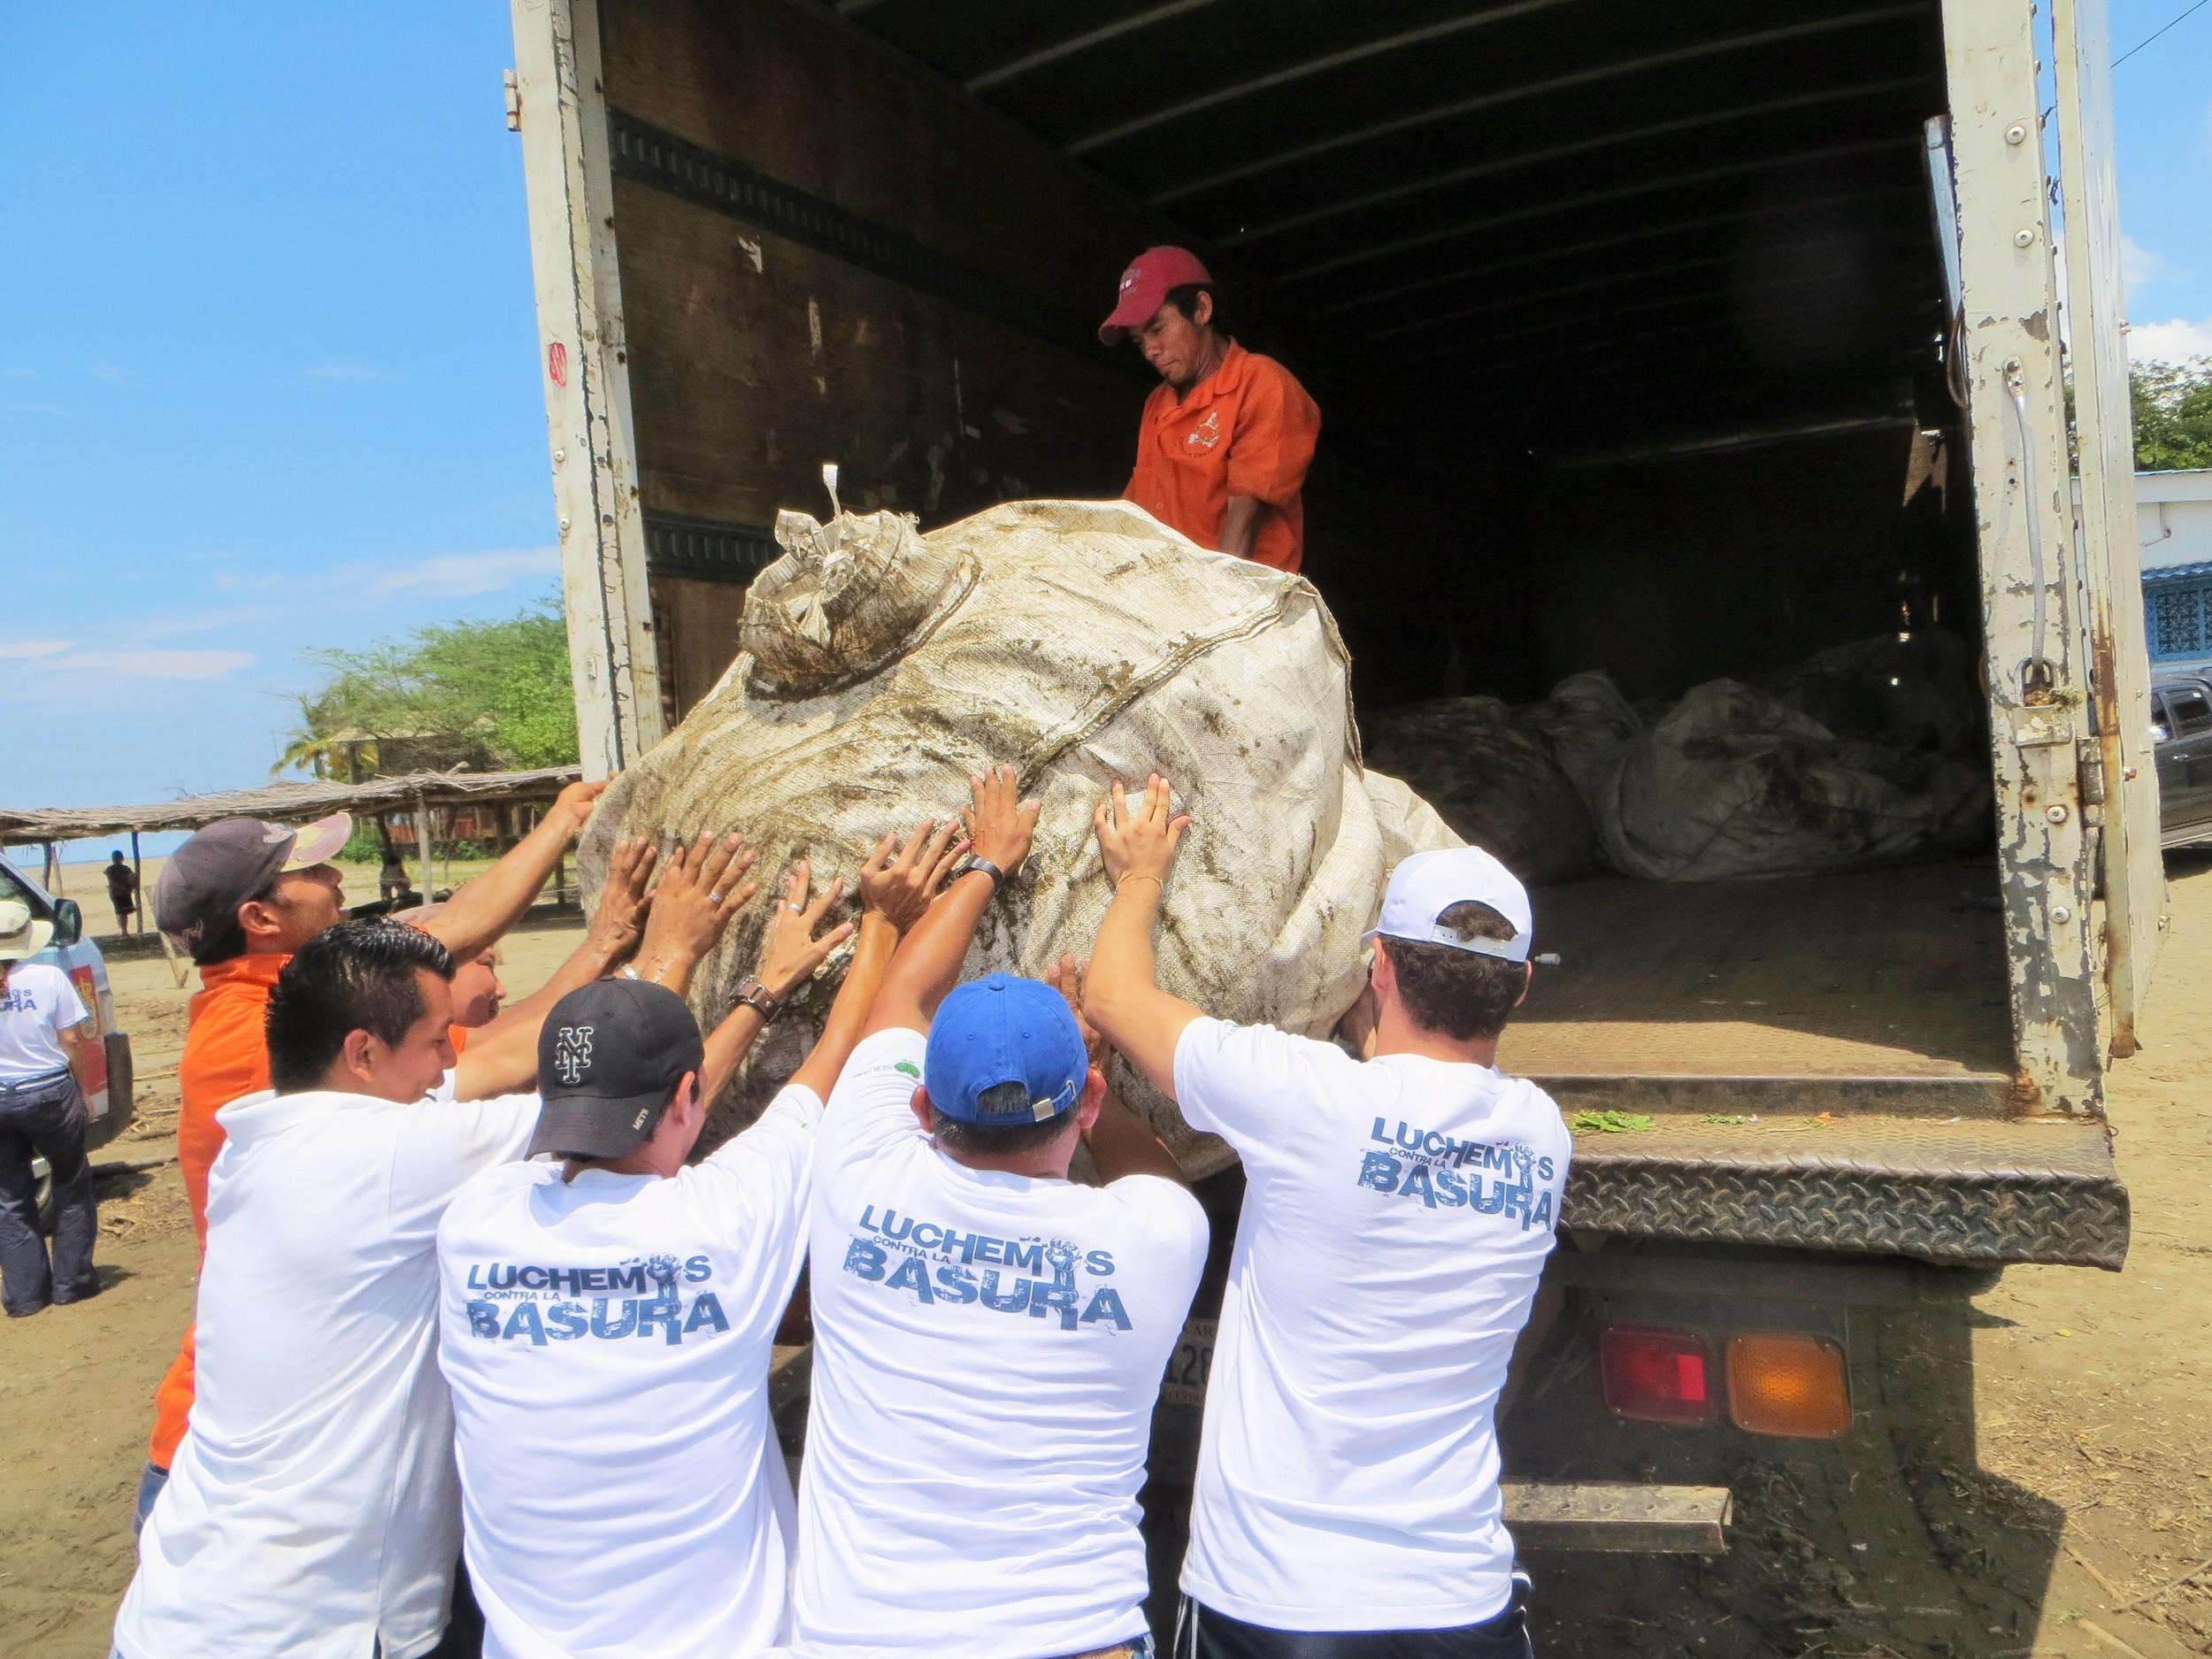 Nicaragua - Paso Pacifico - ICC2013 - 4.JPG